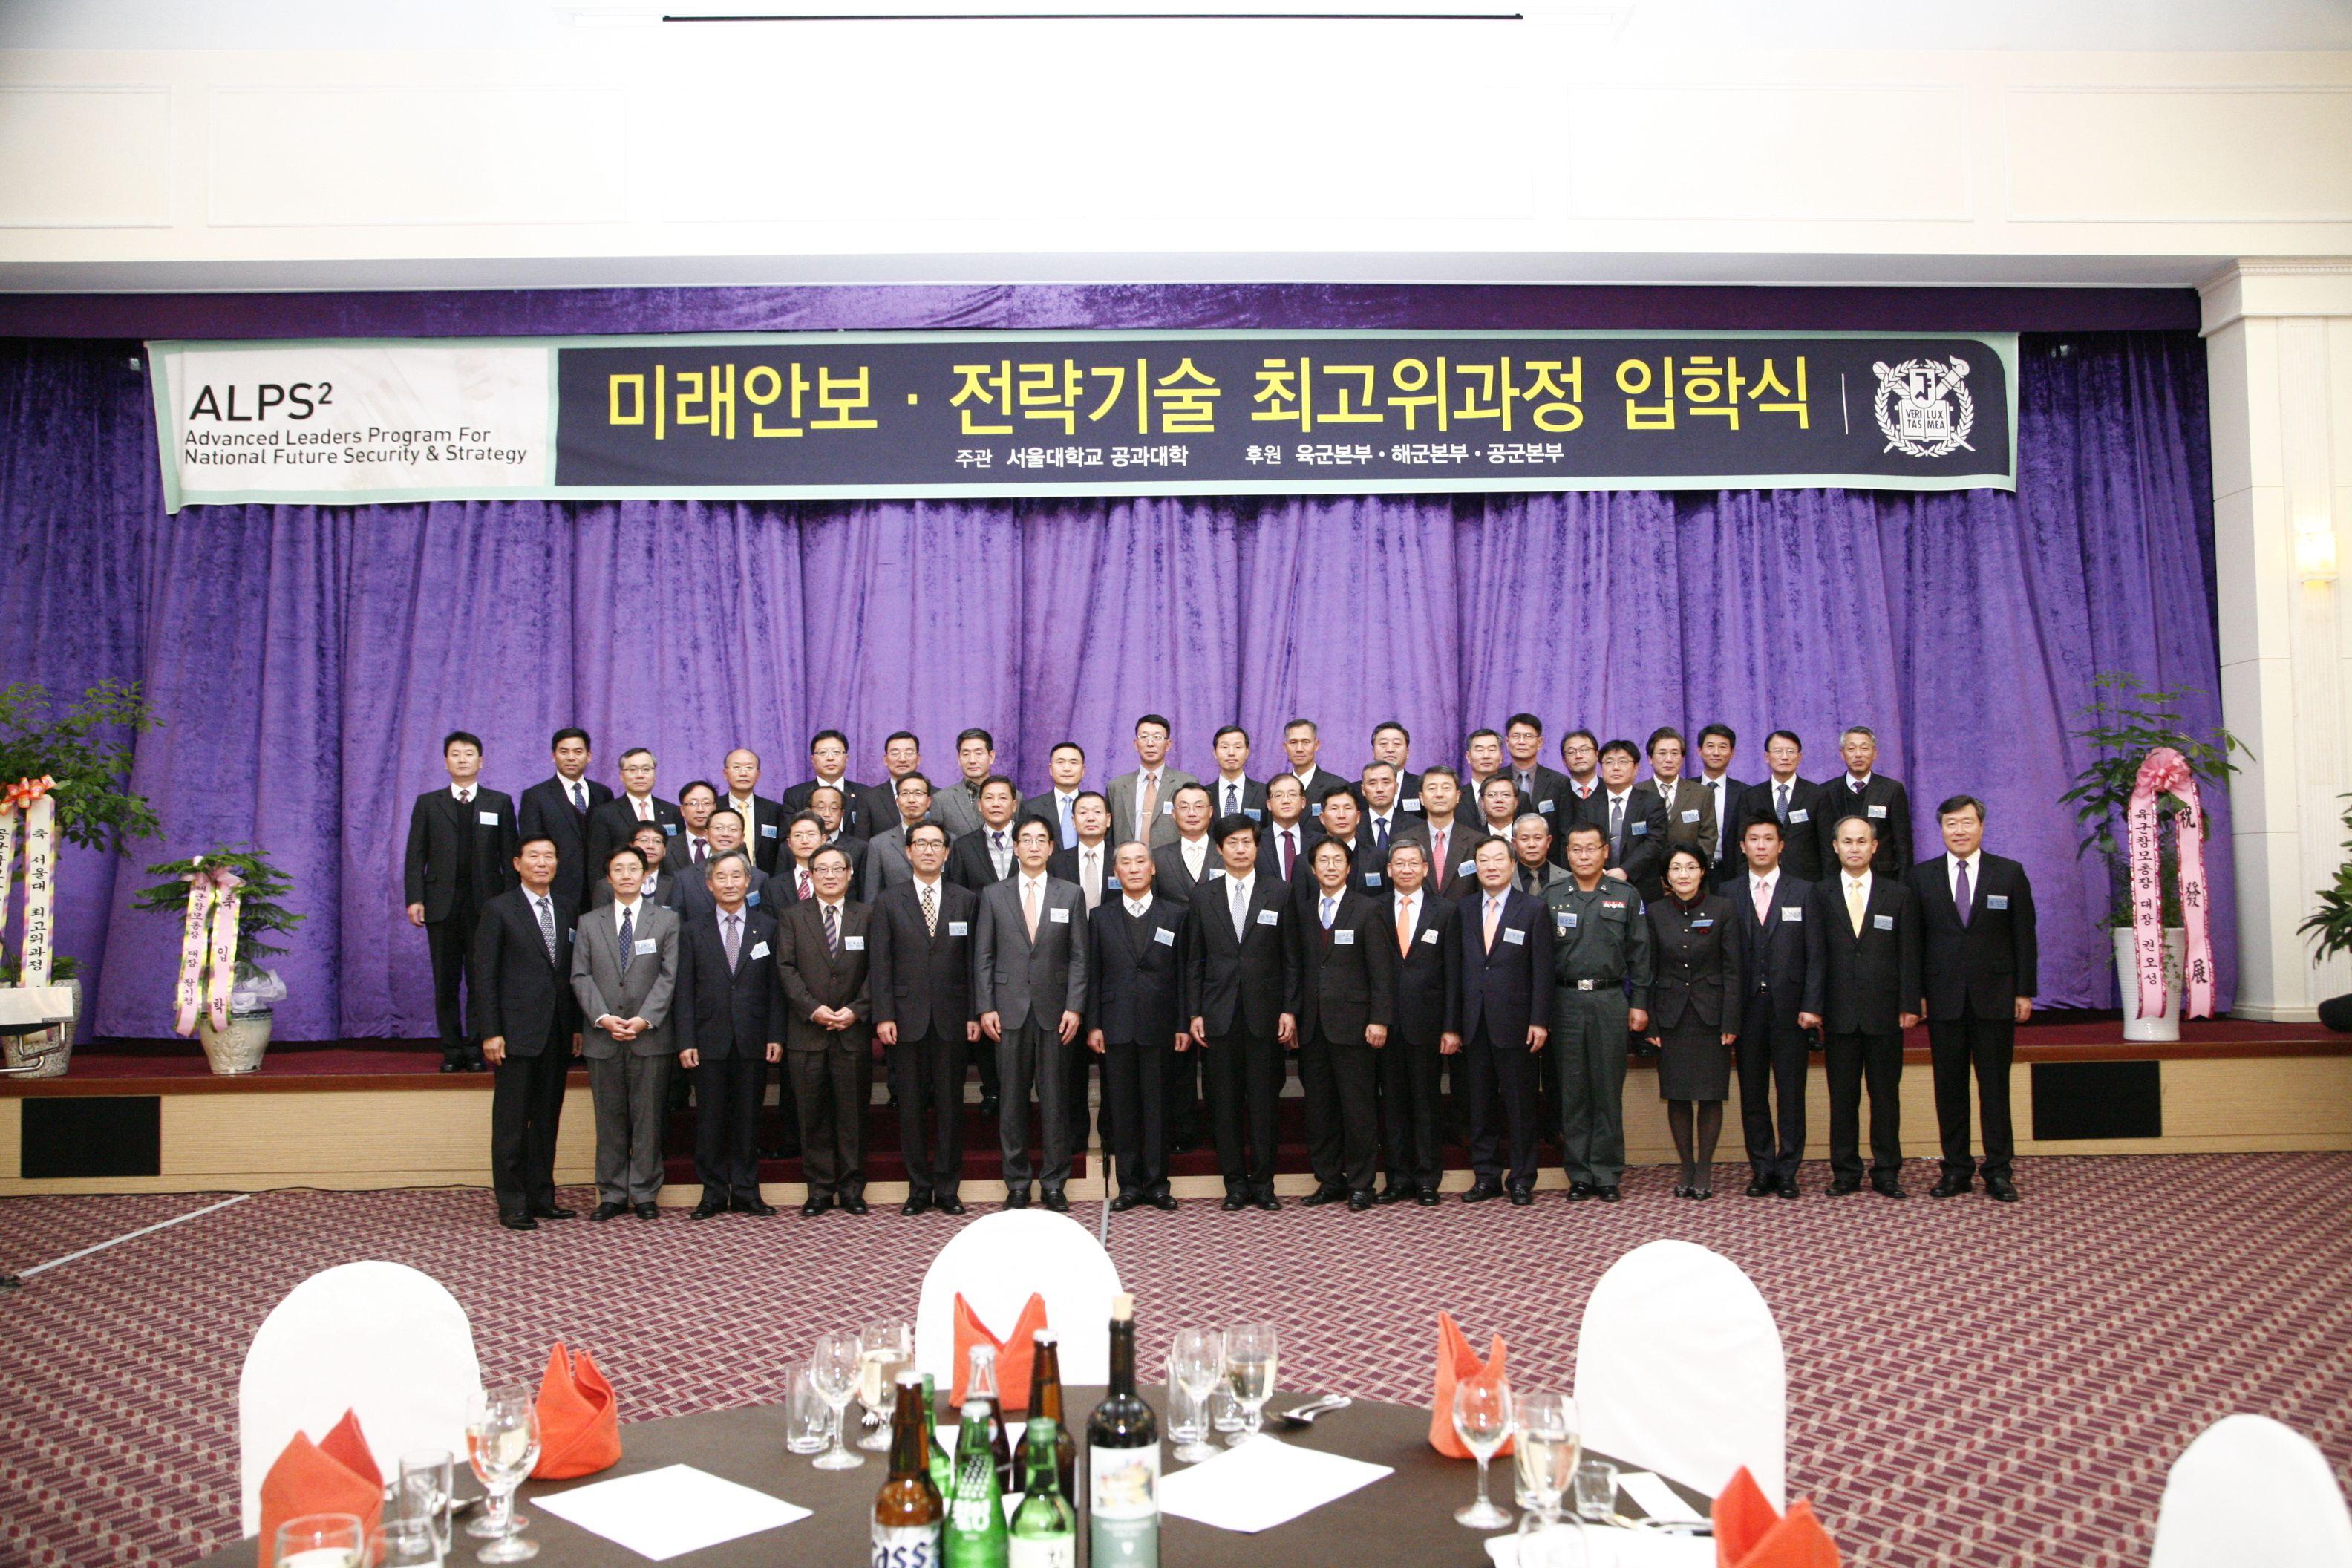 ALPS2 제1기 입학식 (계룡대 무궁화회관, 2013.11.17)